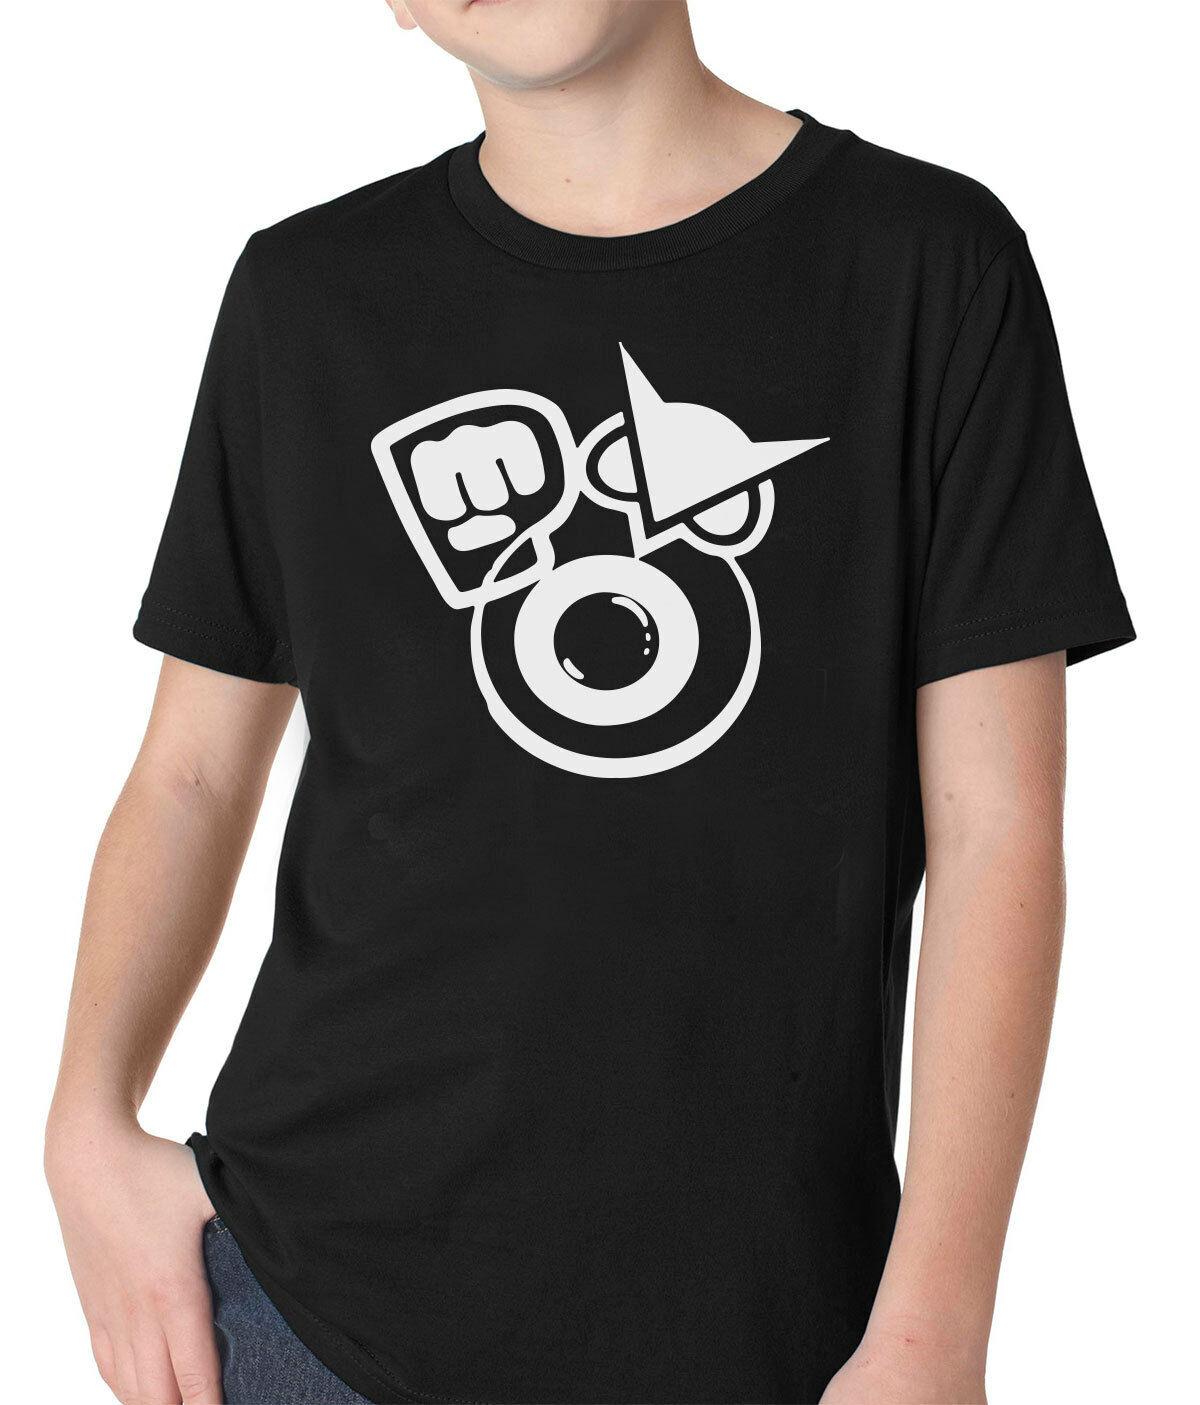 Mens Youth Boys Pewdiepie Merch Tee Shirts T Shirt T-Shirt Short-Sleeve Round Neck Cotton Tshirt for Men Boys